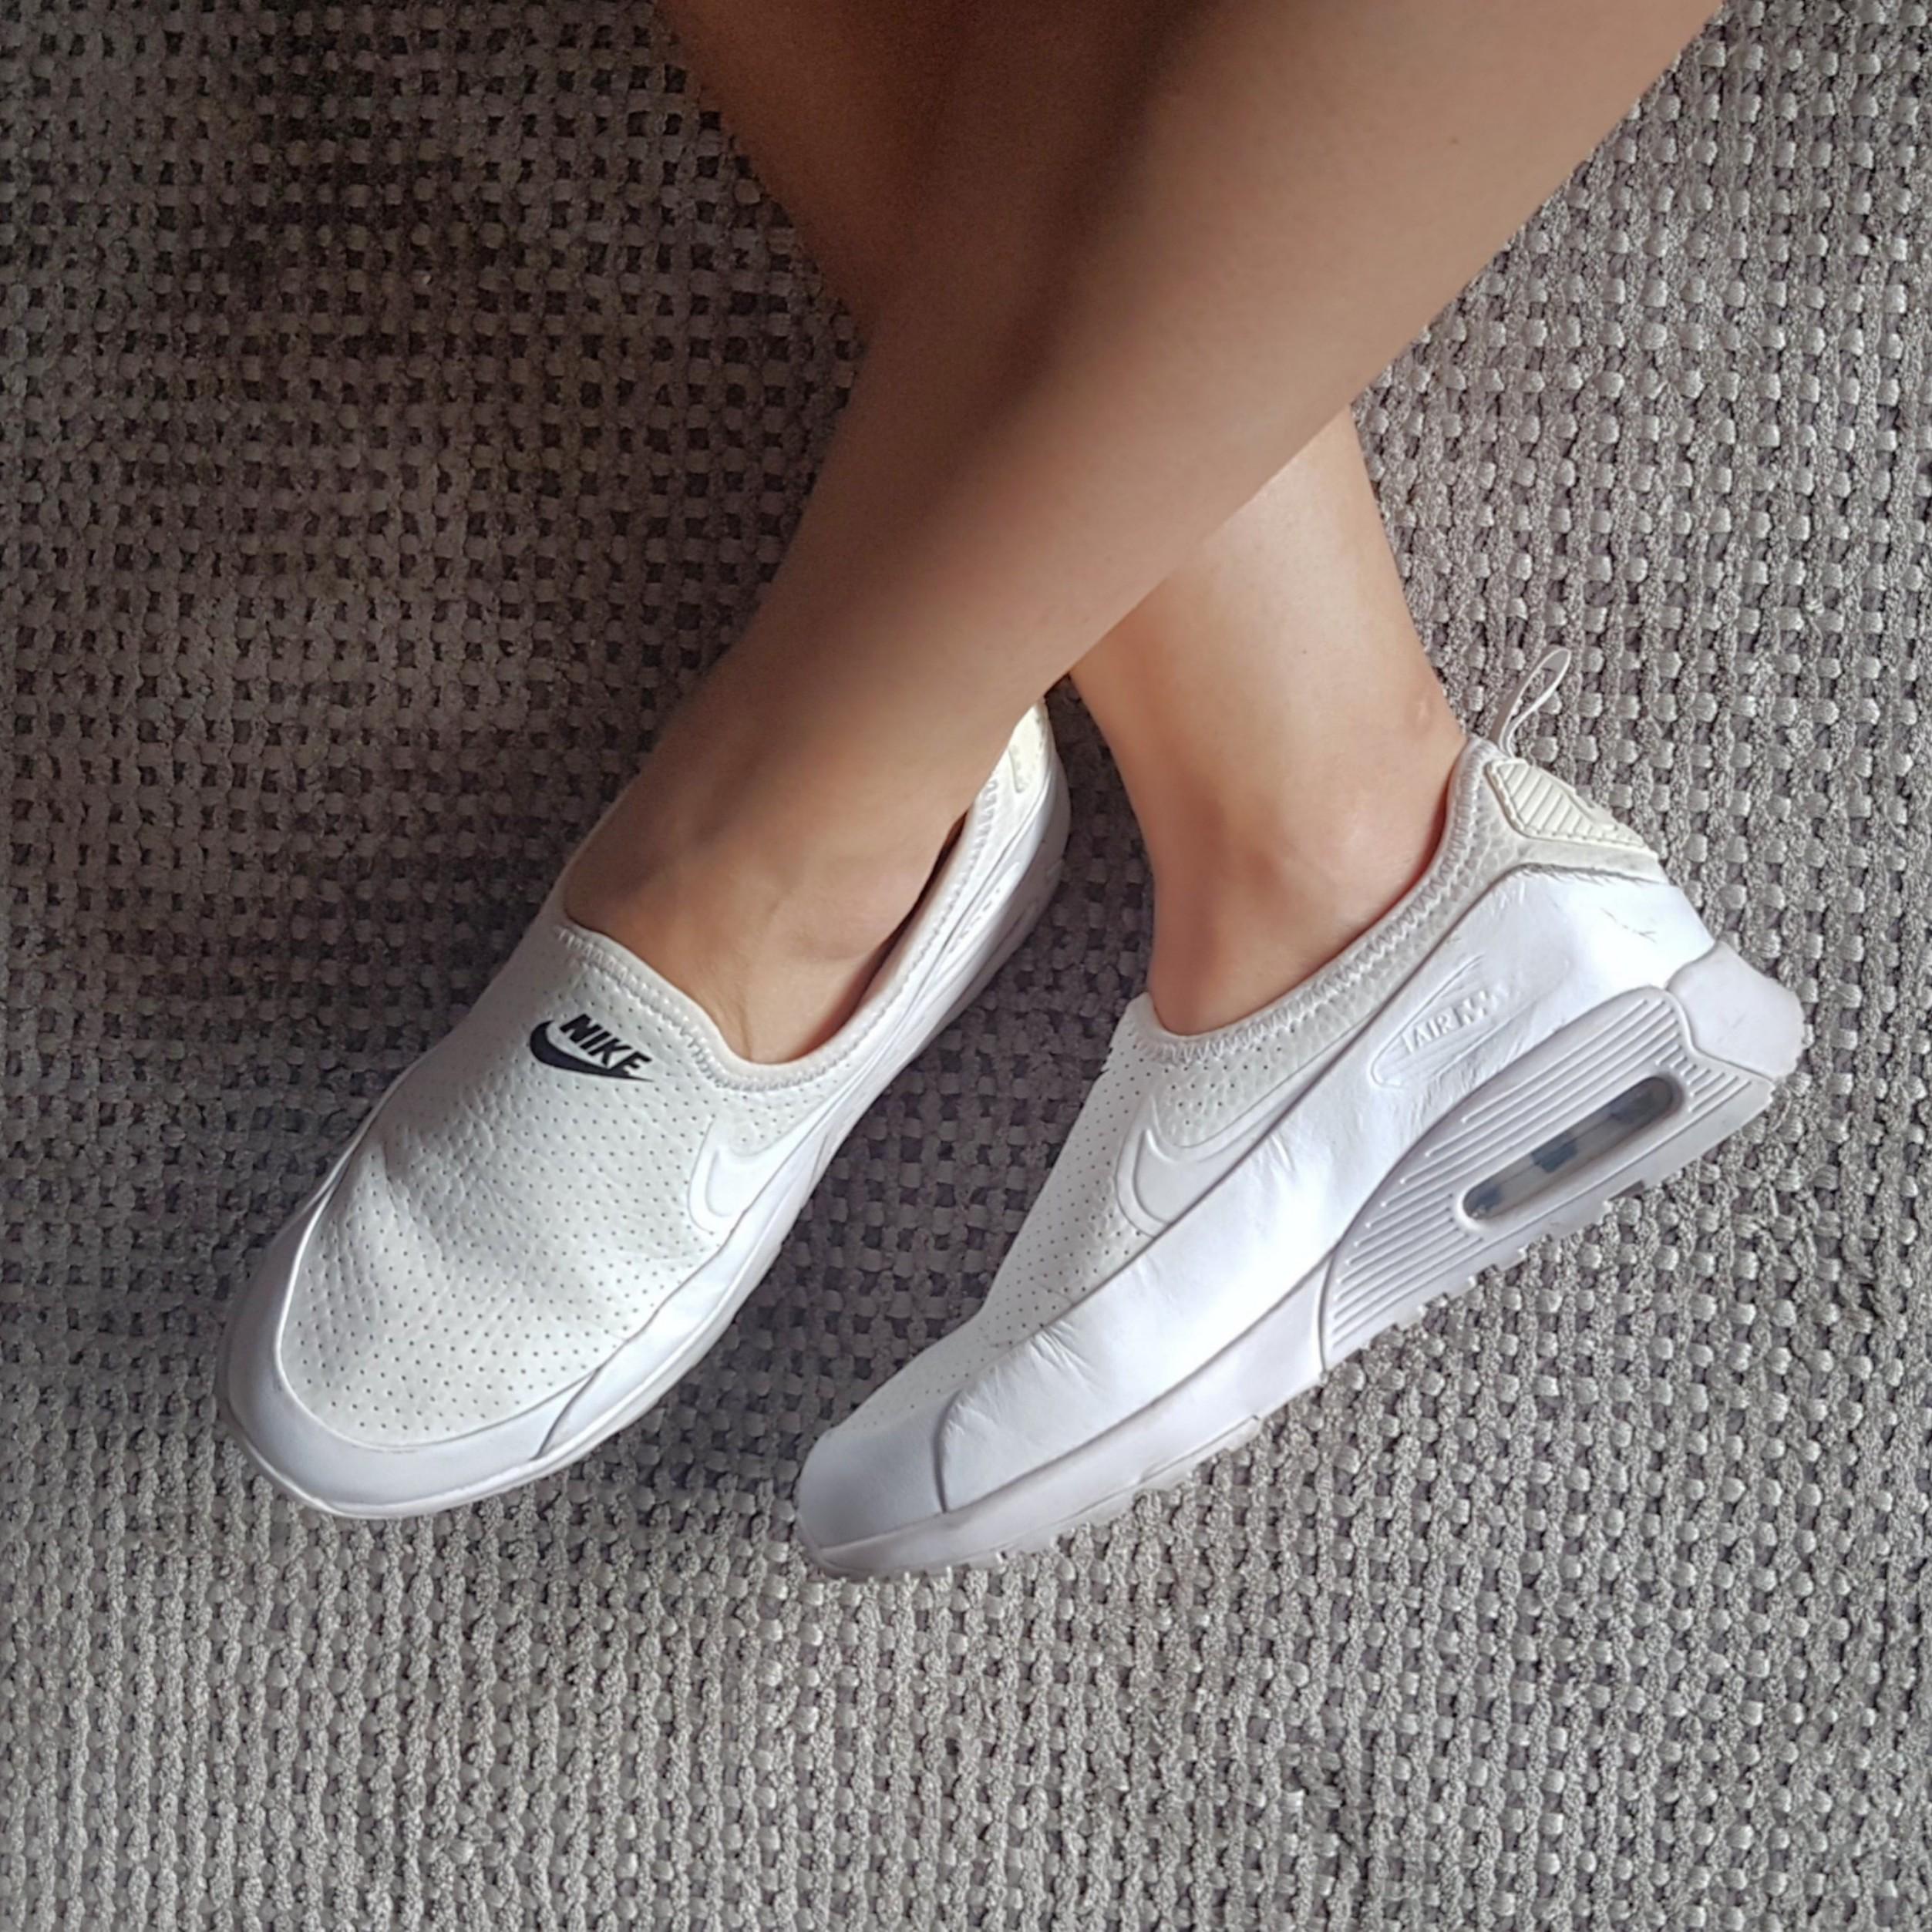 half off 1ea41 c50fc Home · Women s Fashion · Shoes. photo photo ...